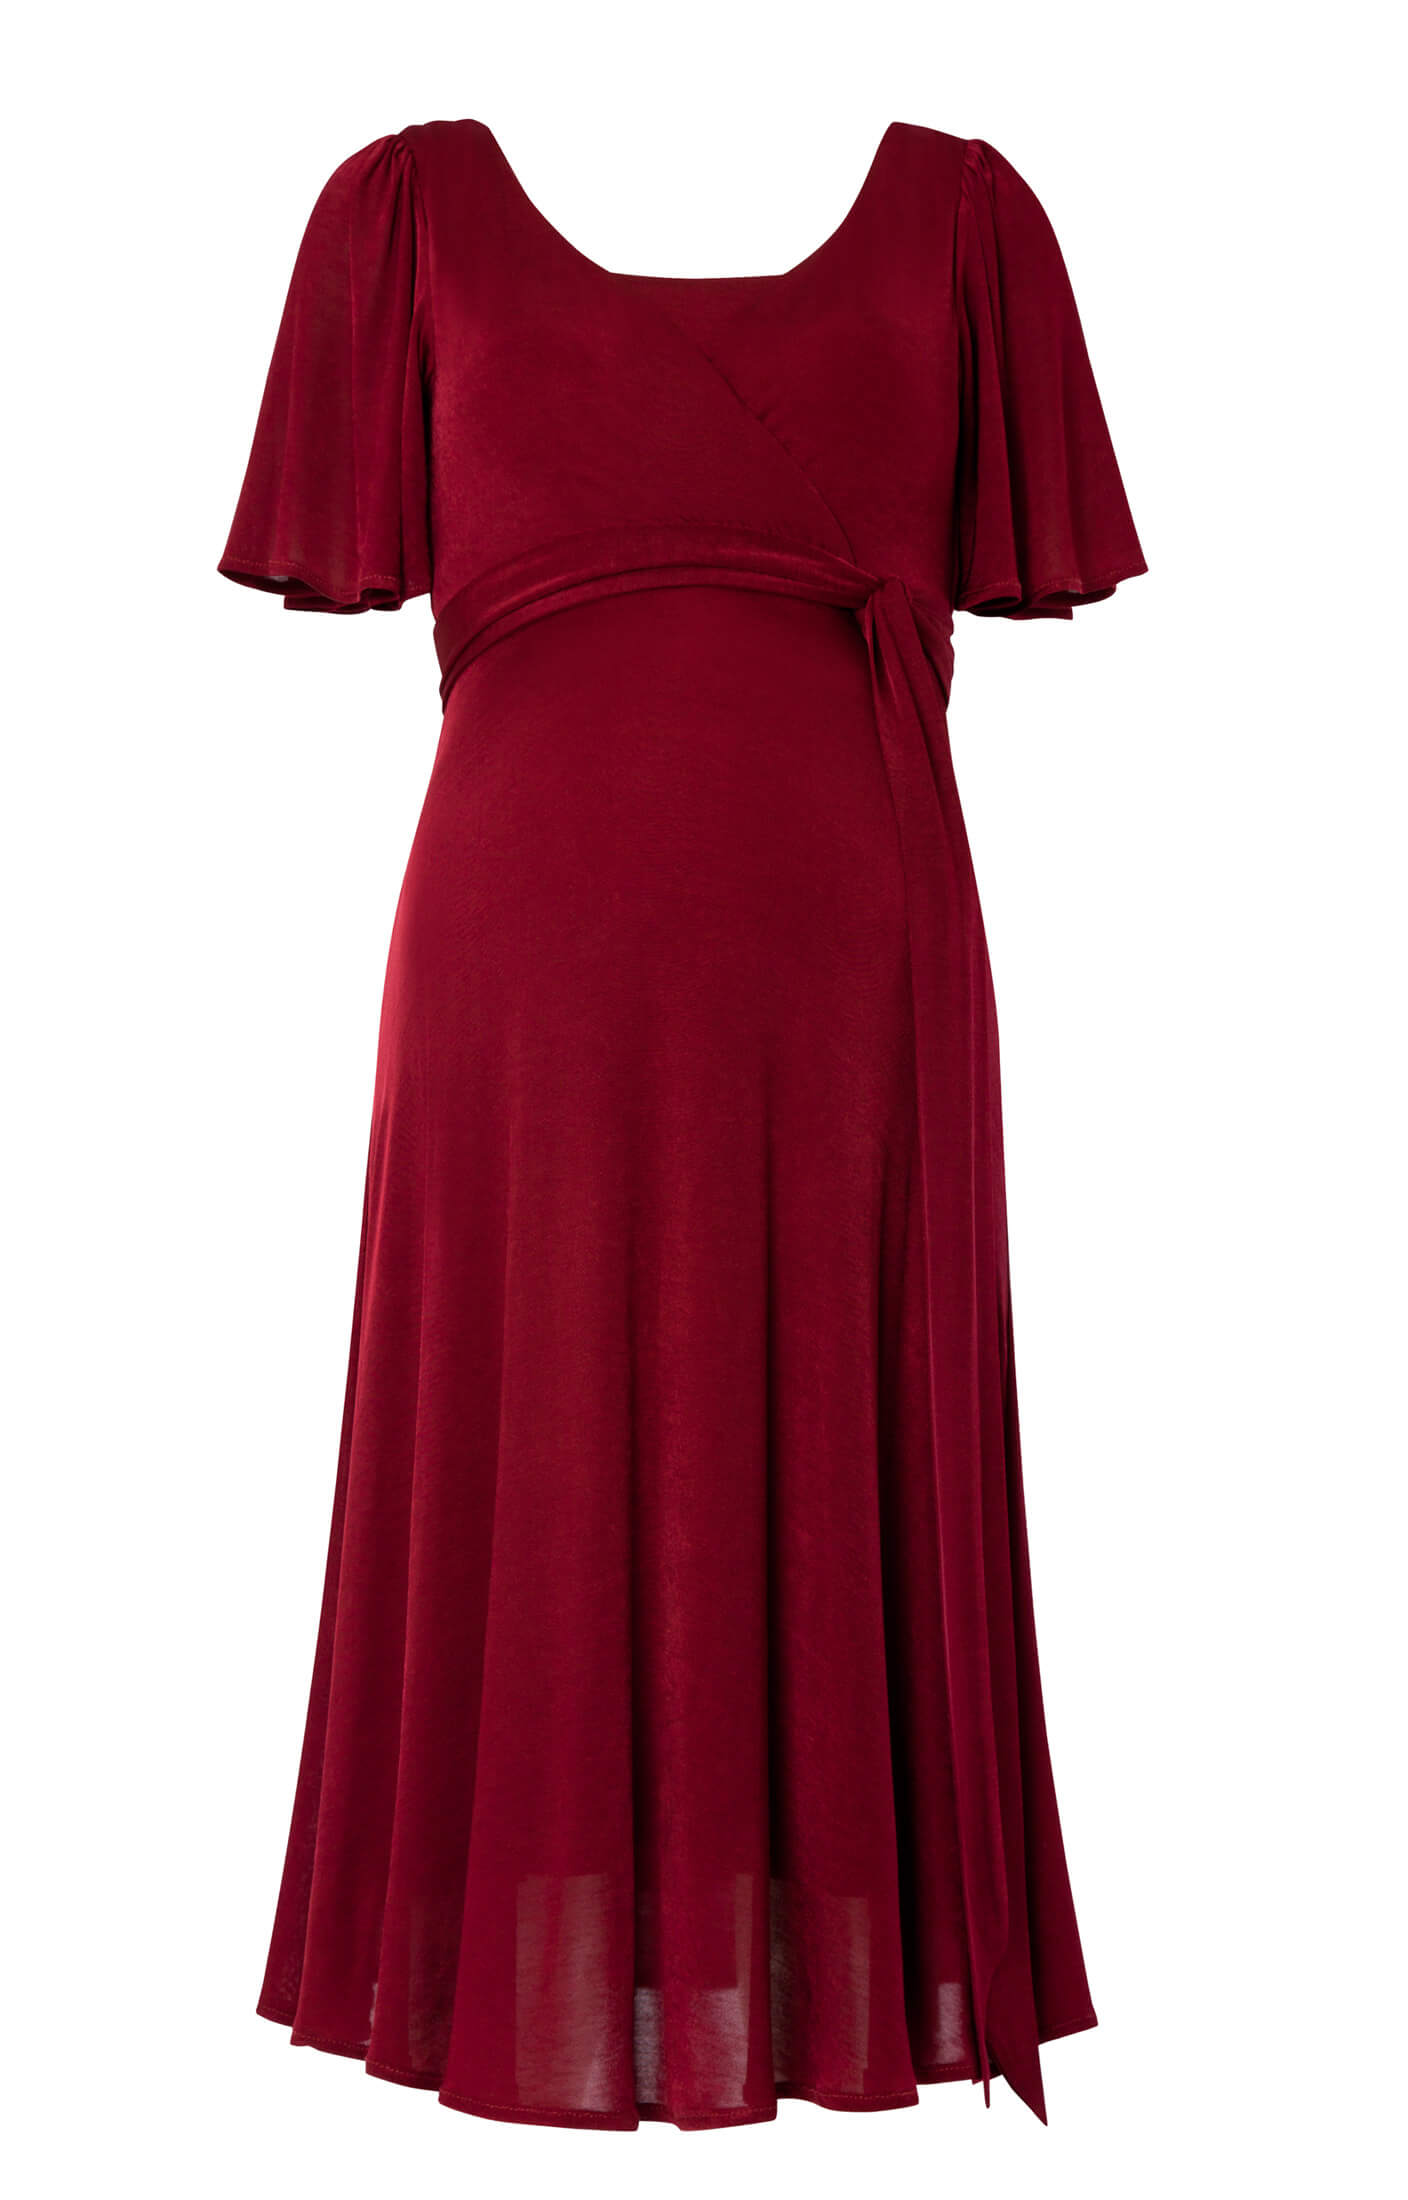 Alicia Nursing Dress Berry - Maternity Wedding Dresses ...